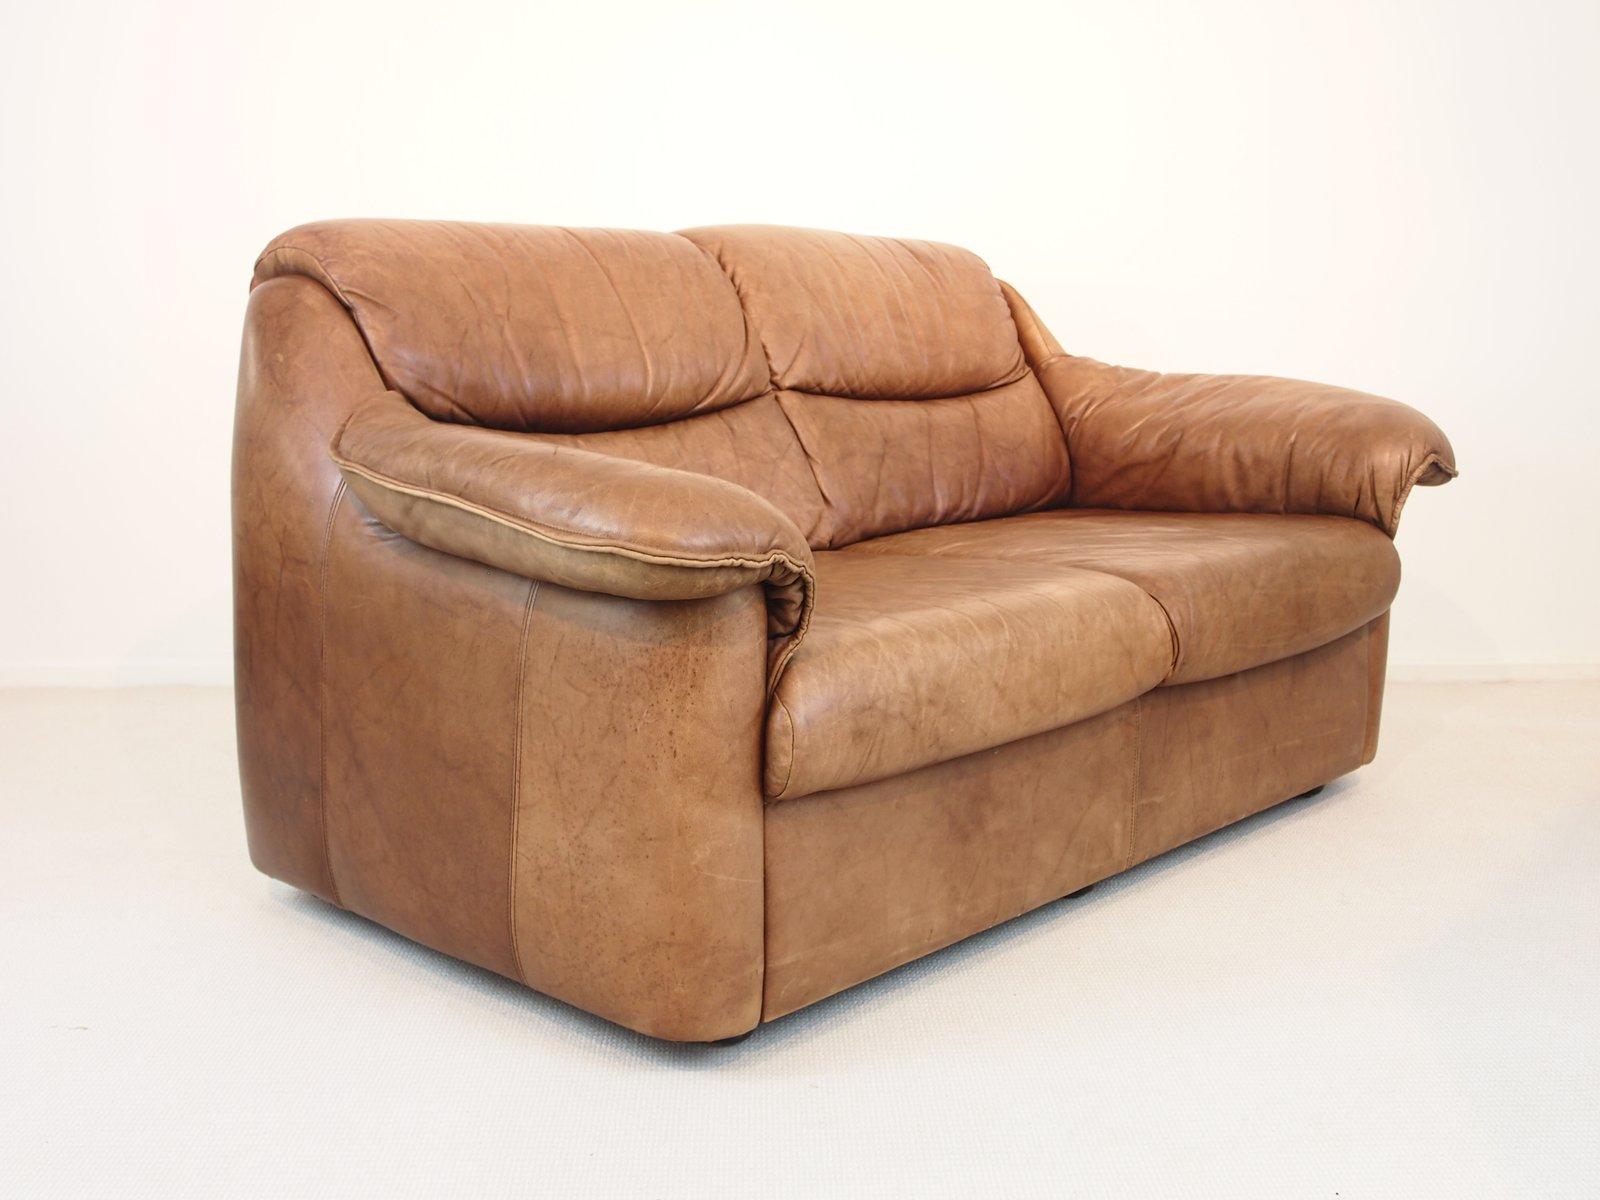 Vintage Leather Saddle 88